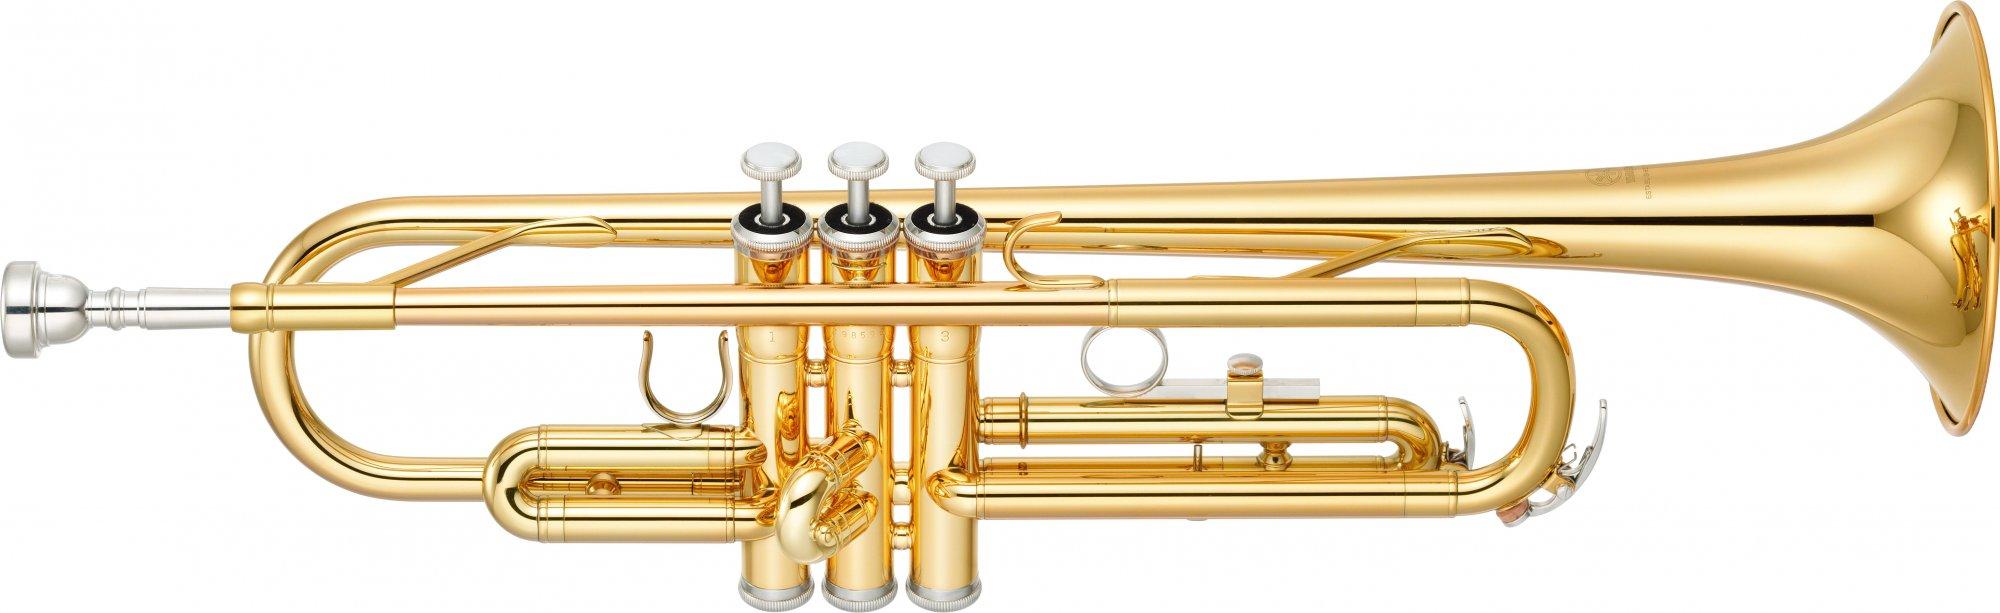 Yamaha Trumpet YTR2330